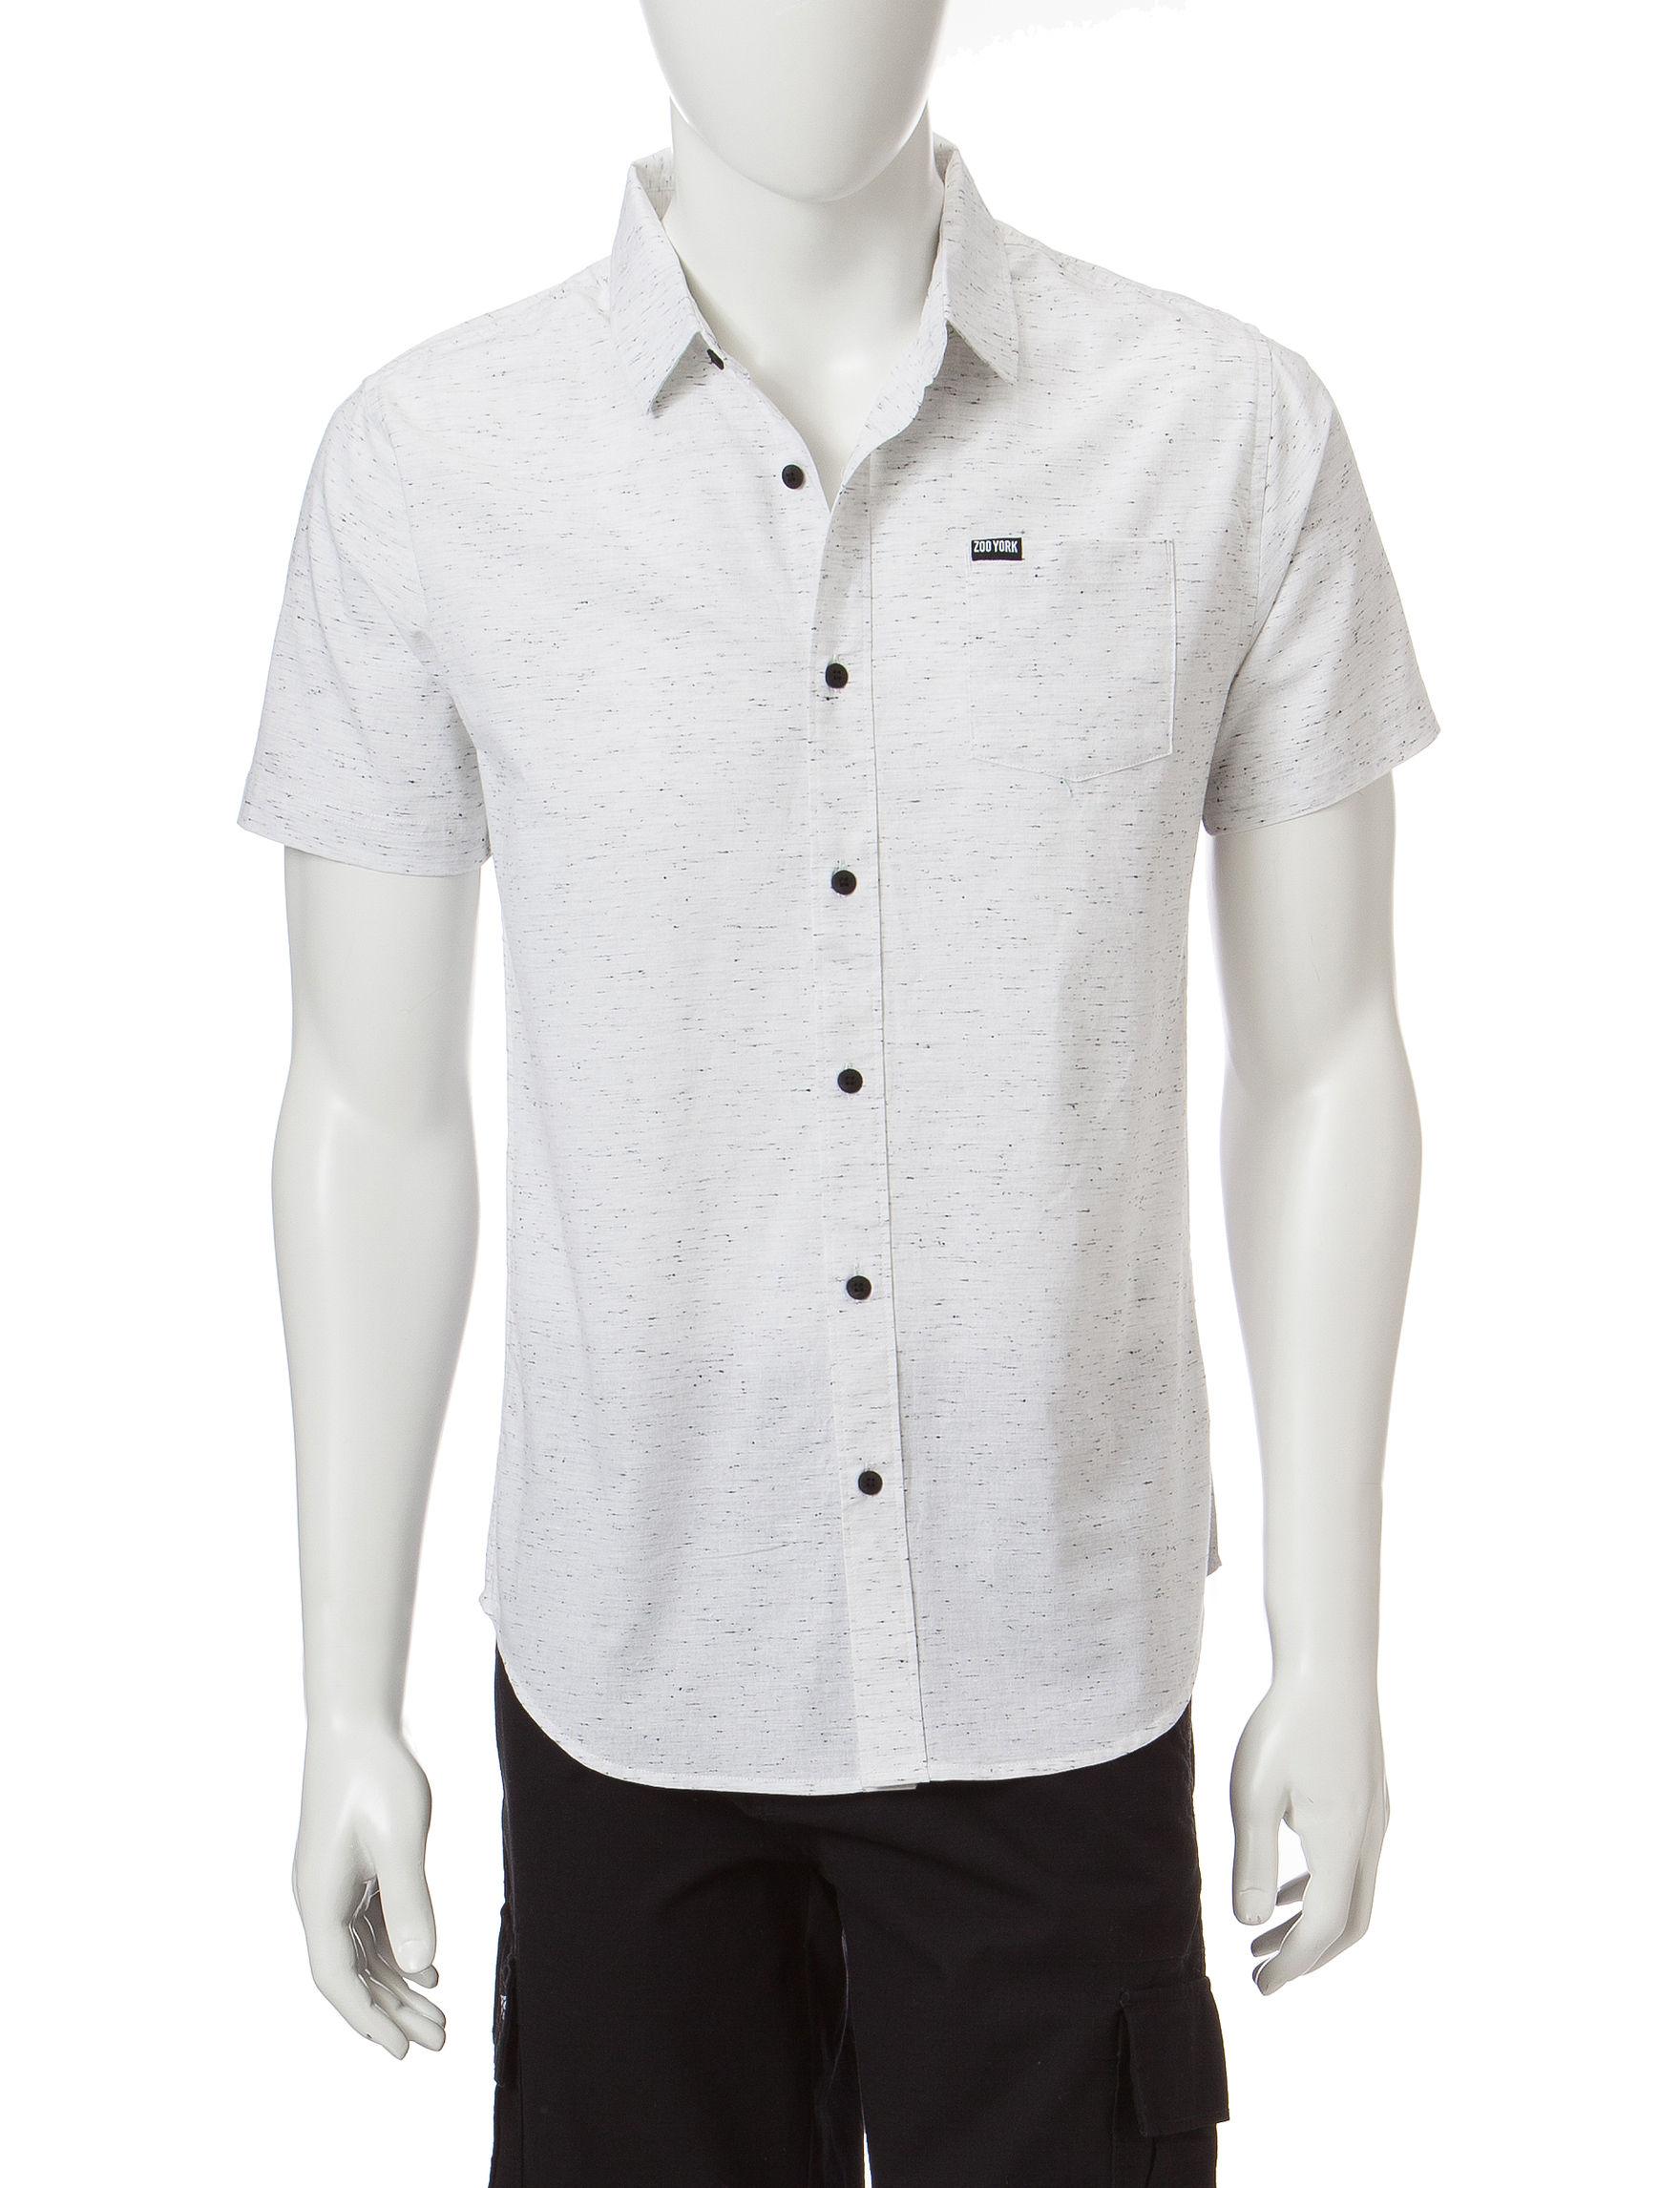 Zoo York White Casual Button Down Shirts